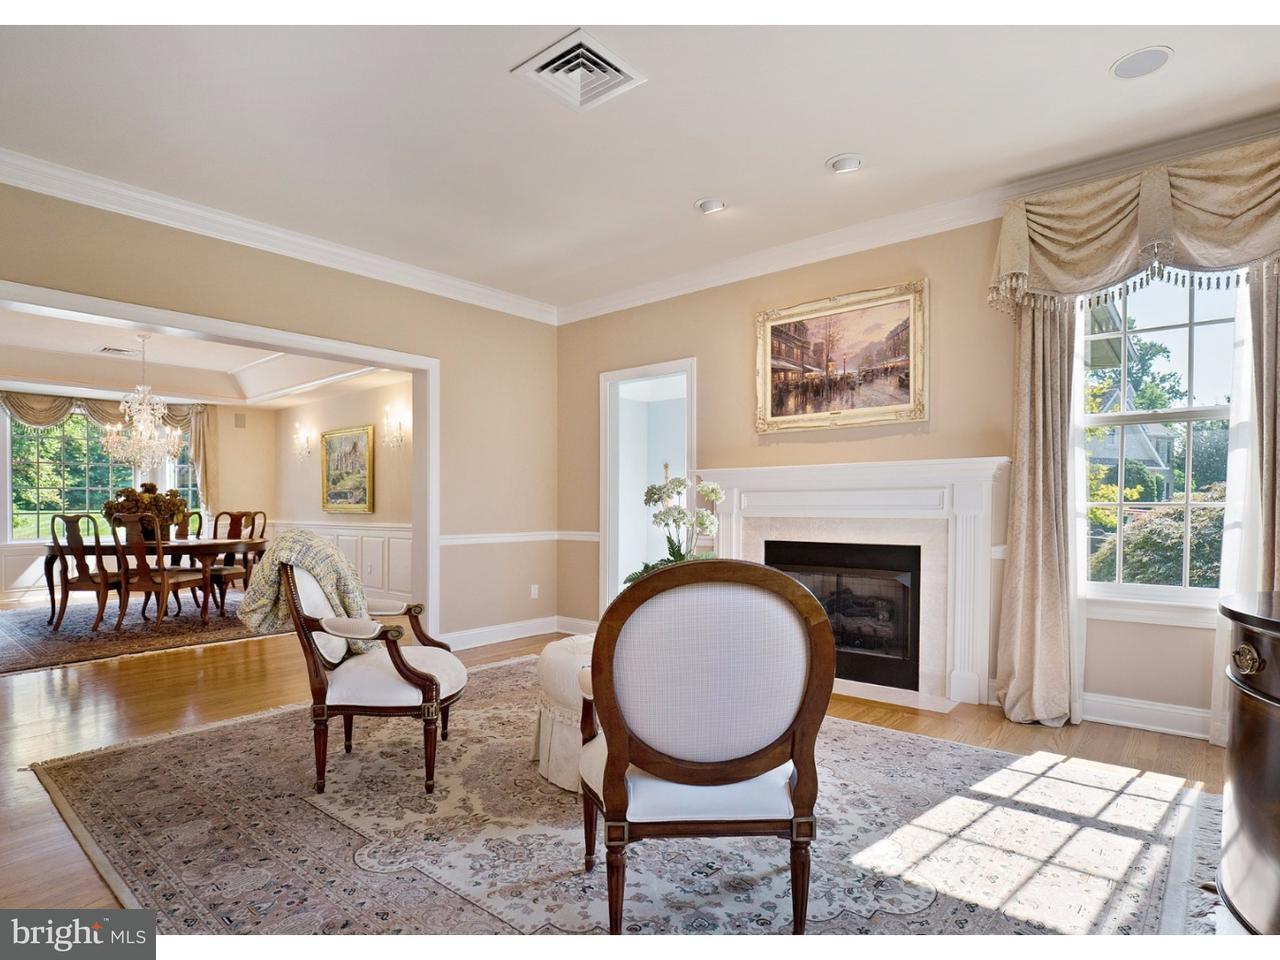 3683  Sablewood Doylestown , PA 18902